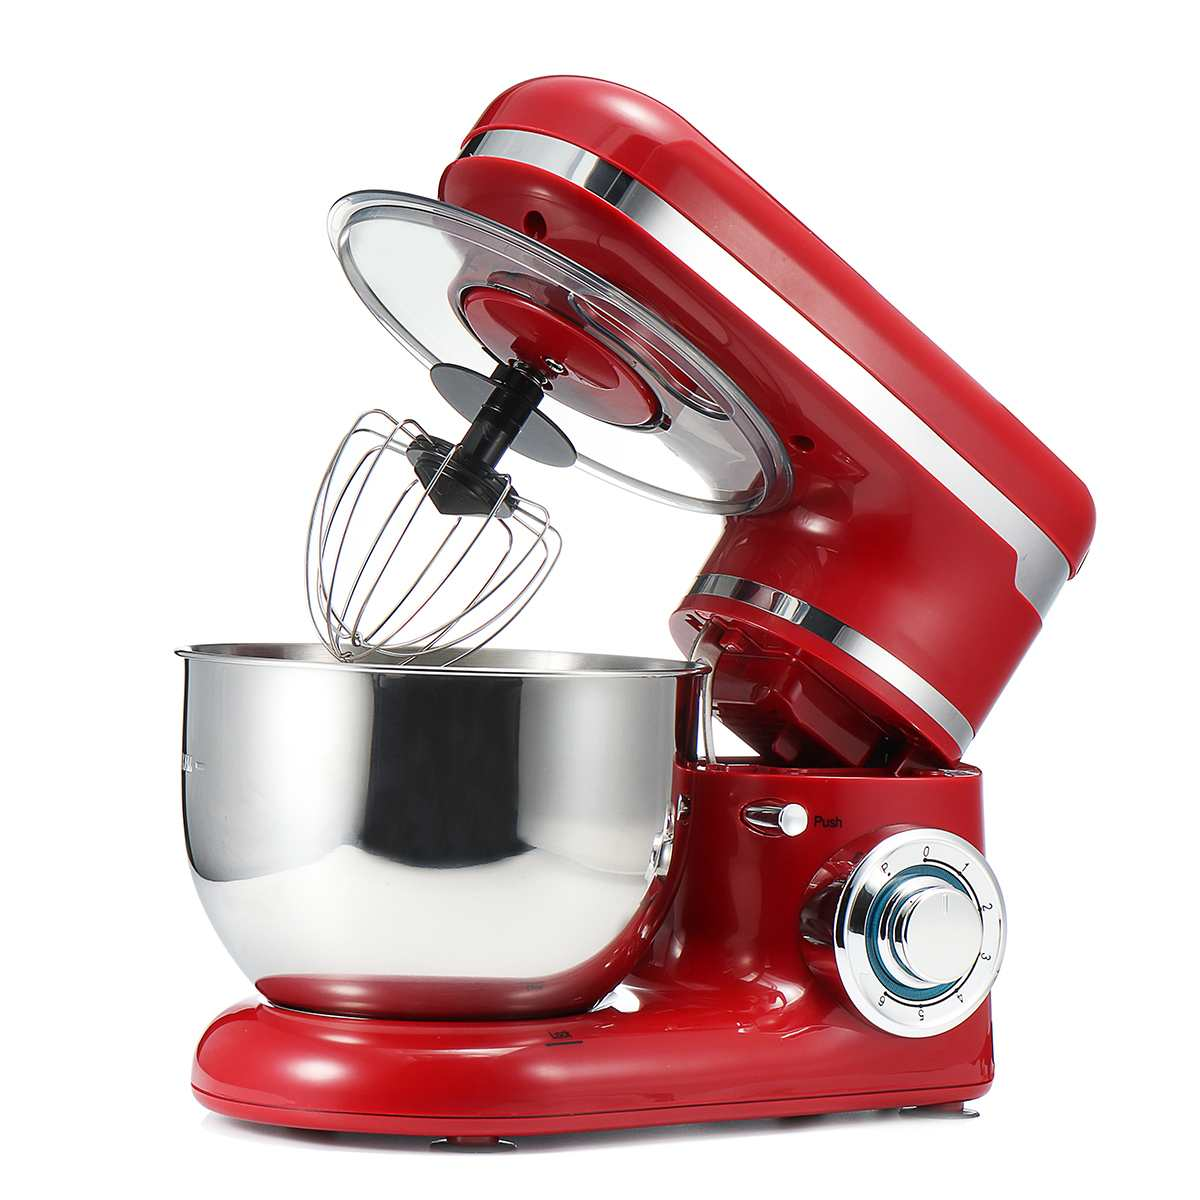 1200W 4L Edelstahl Schüssel Mixer Küche Mixer Mixer Creme Eier Schneebesen Kuchen Teig Maker Brot Mischer Maschine Lebensmittel prozessor